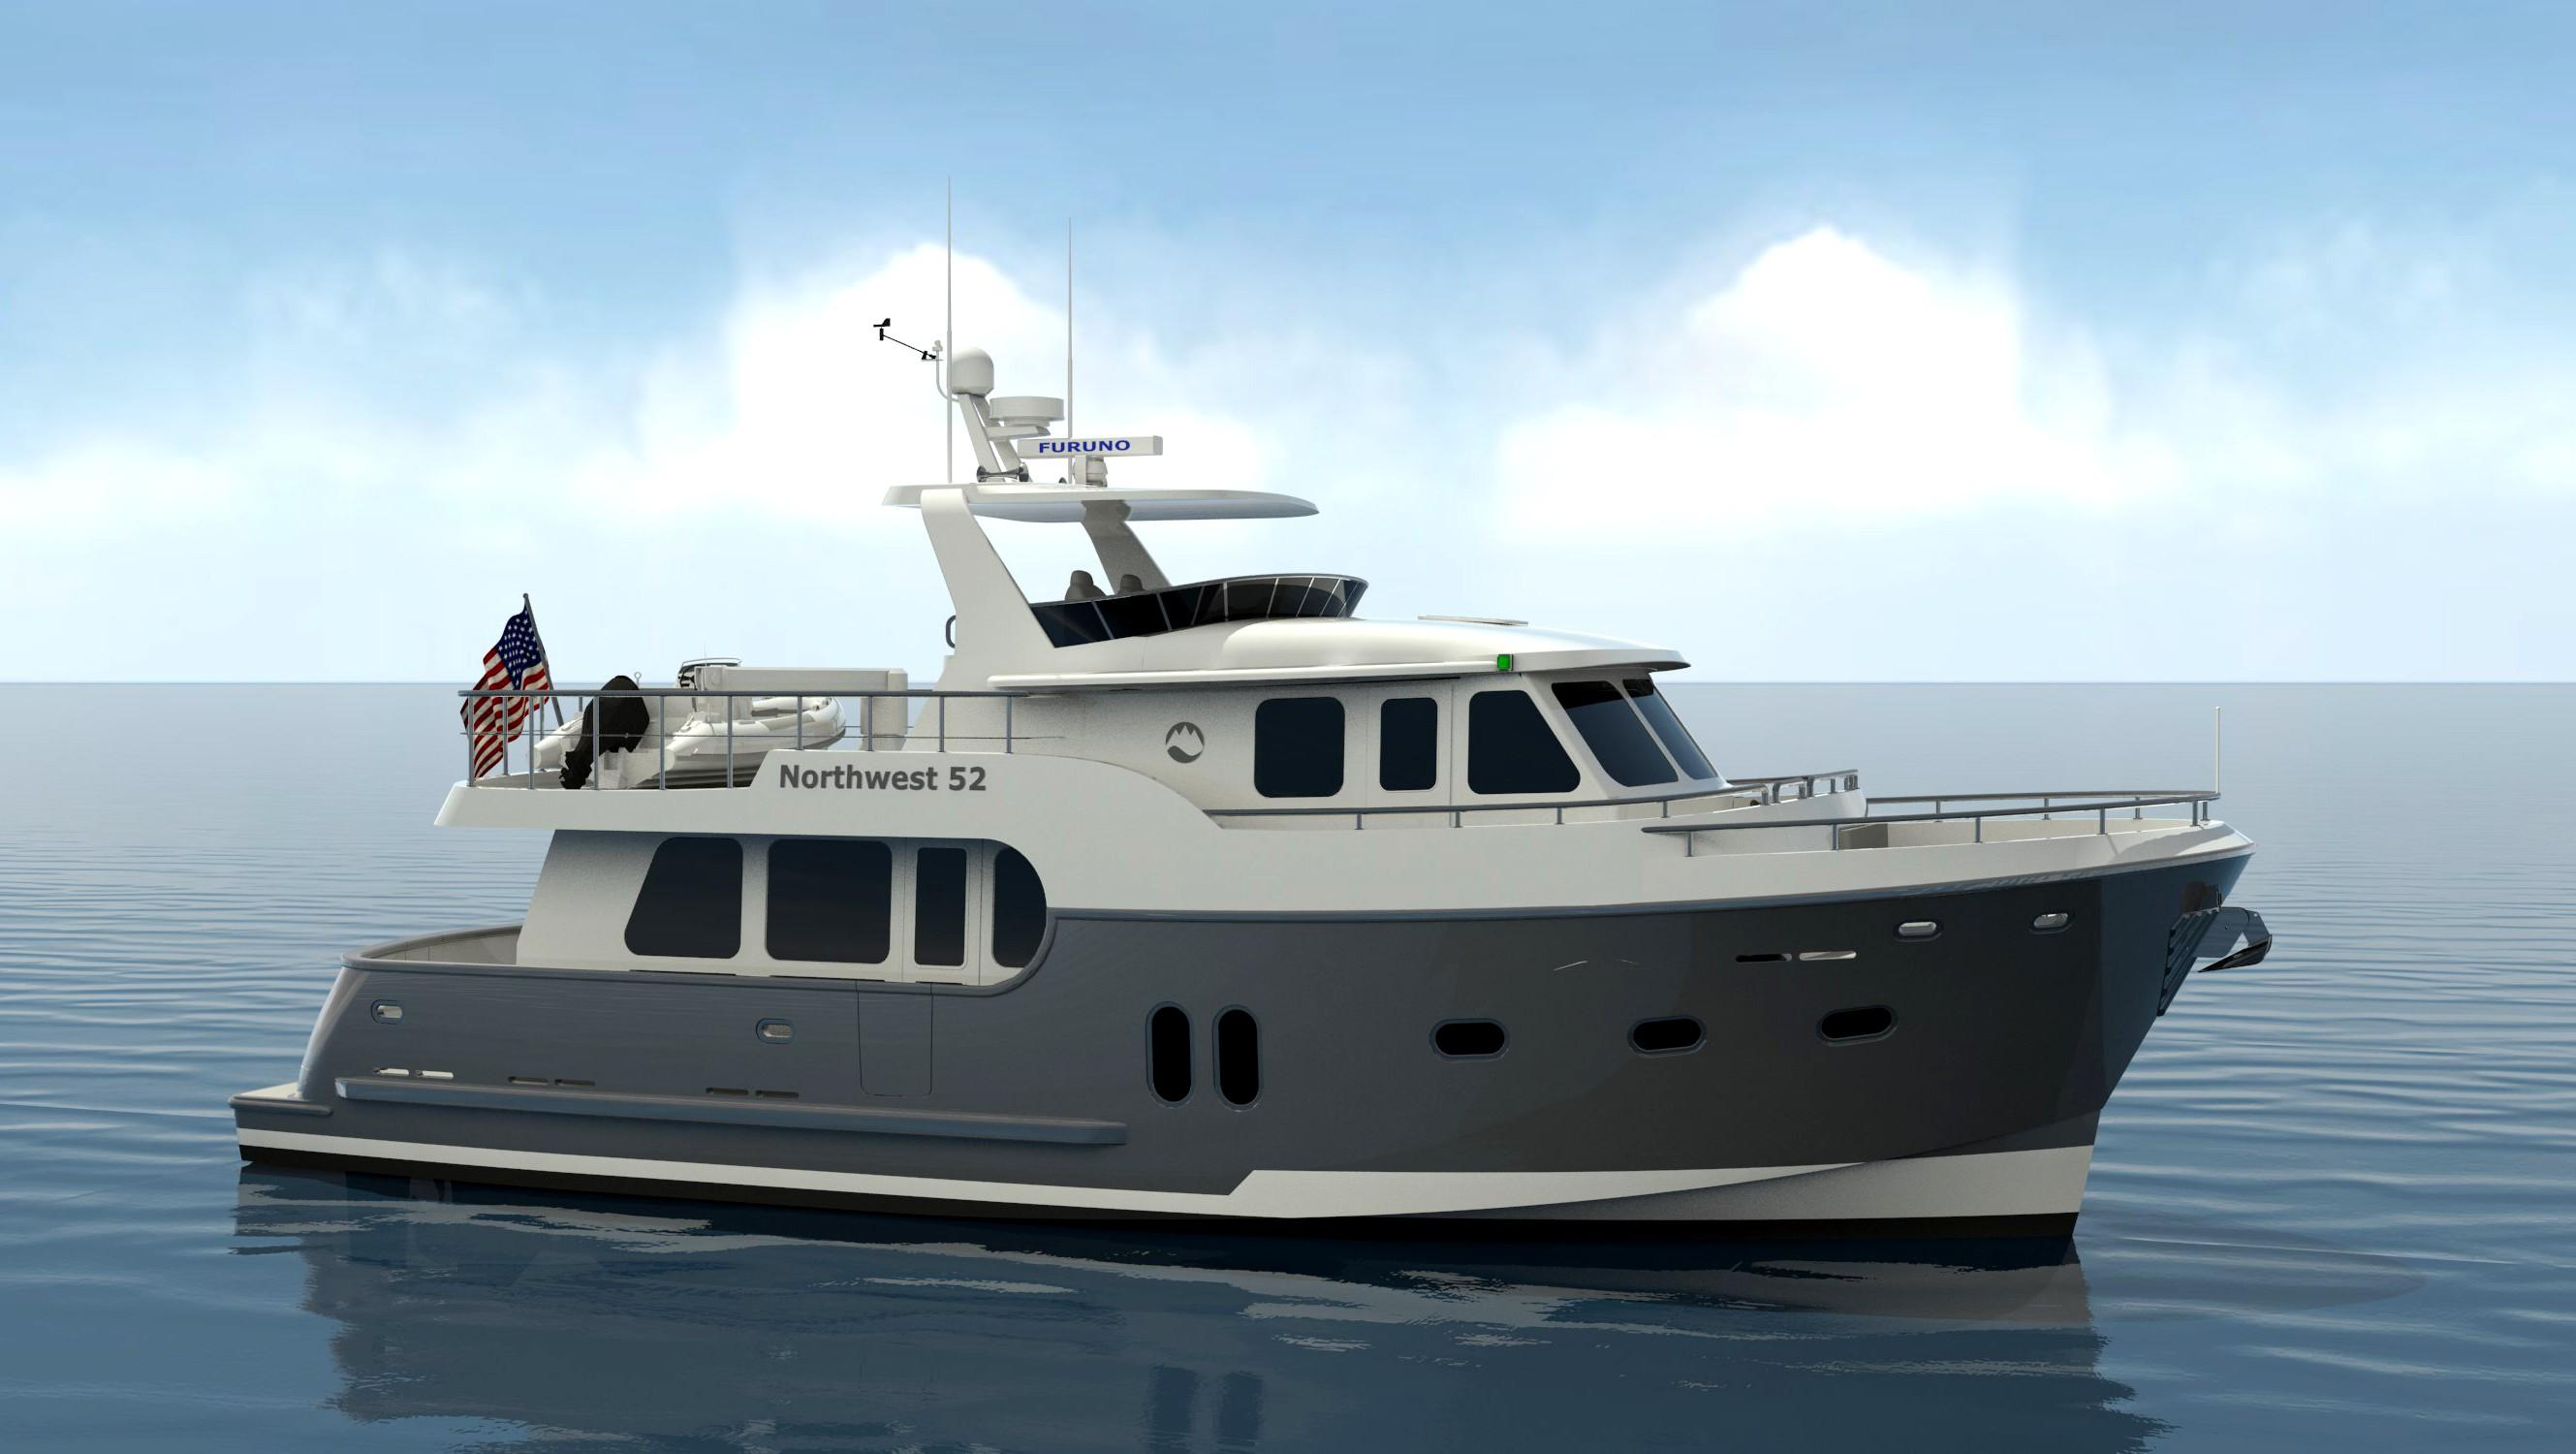 2019 Northwest 52 Power Boat For Sale Wwwyachtworldcom